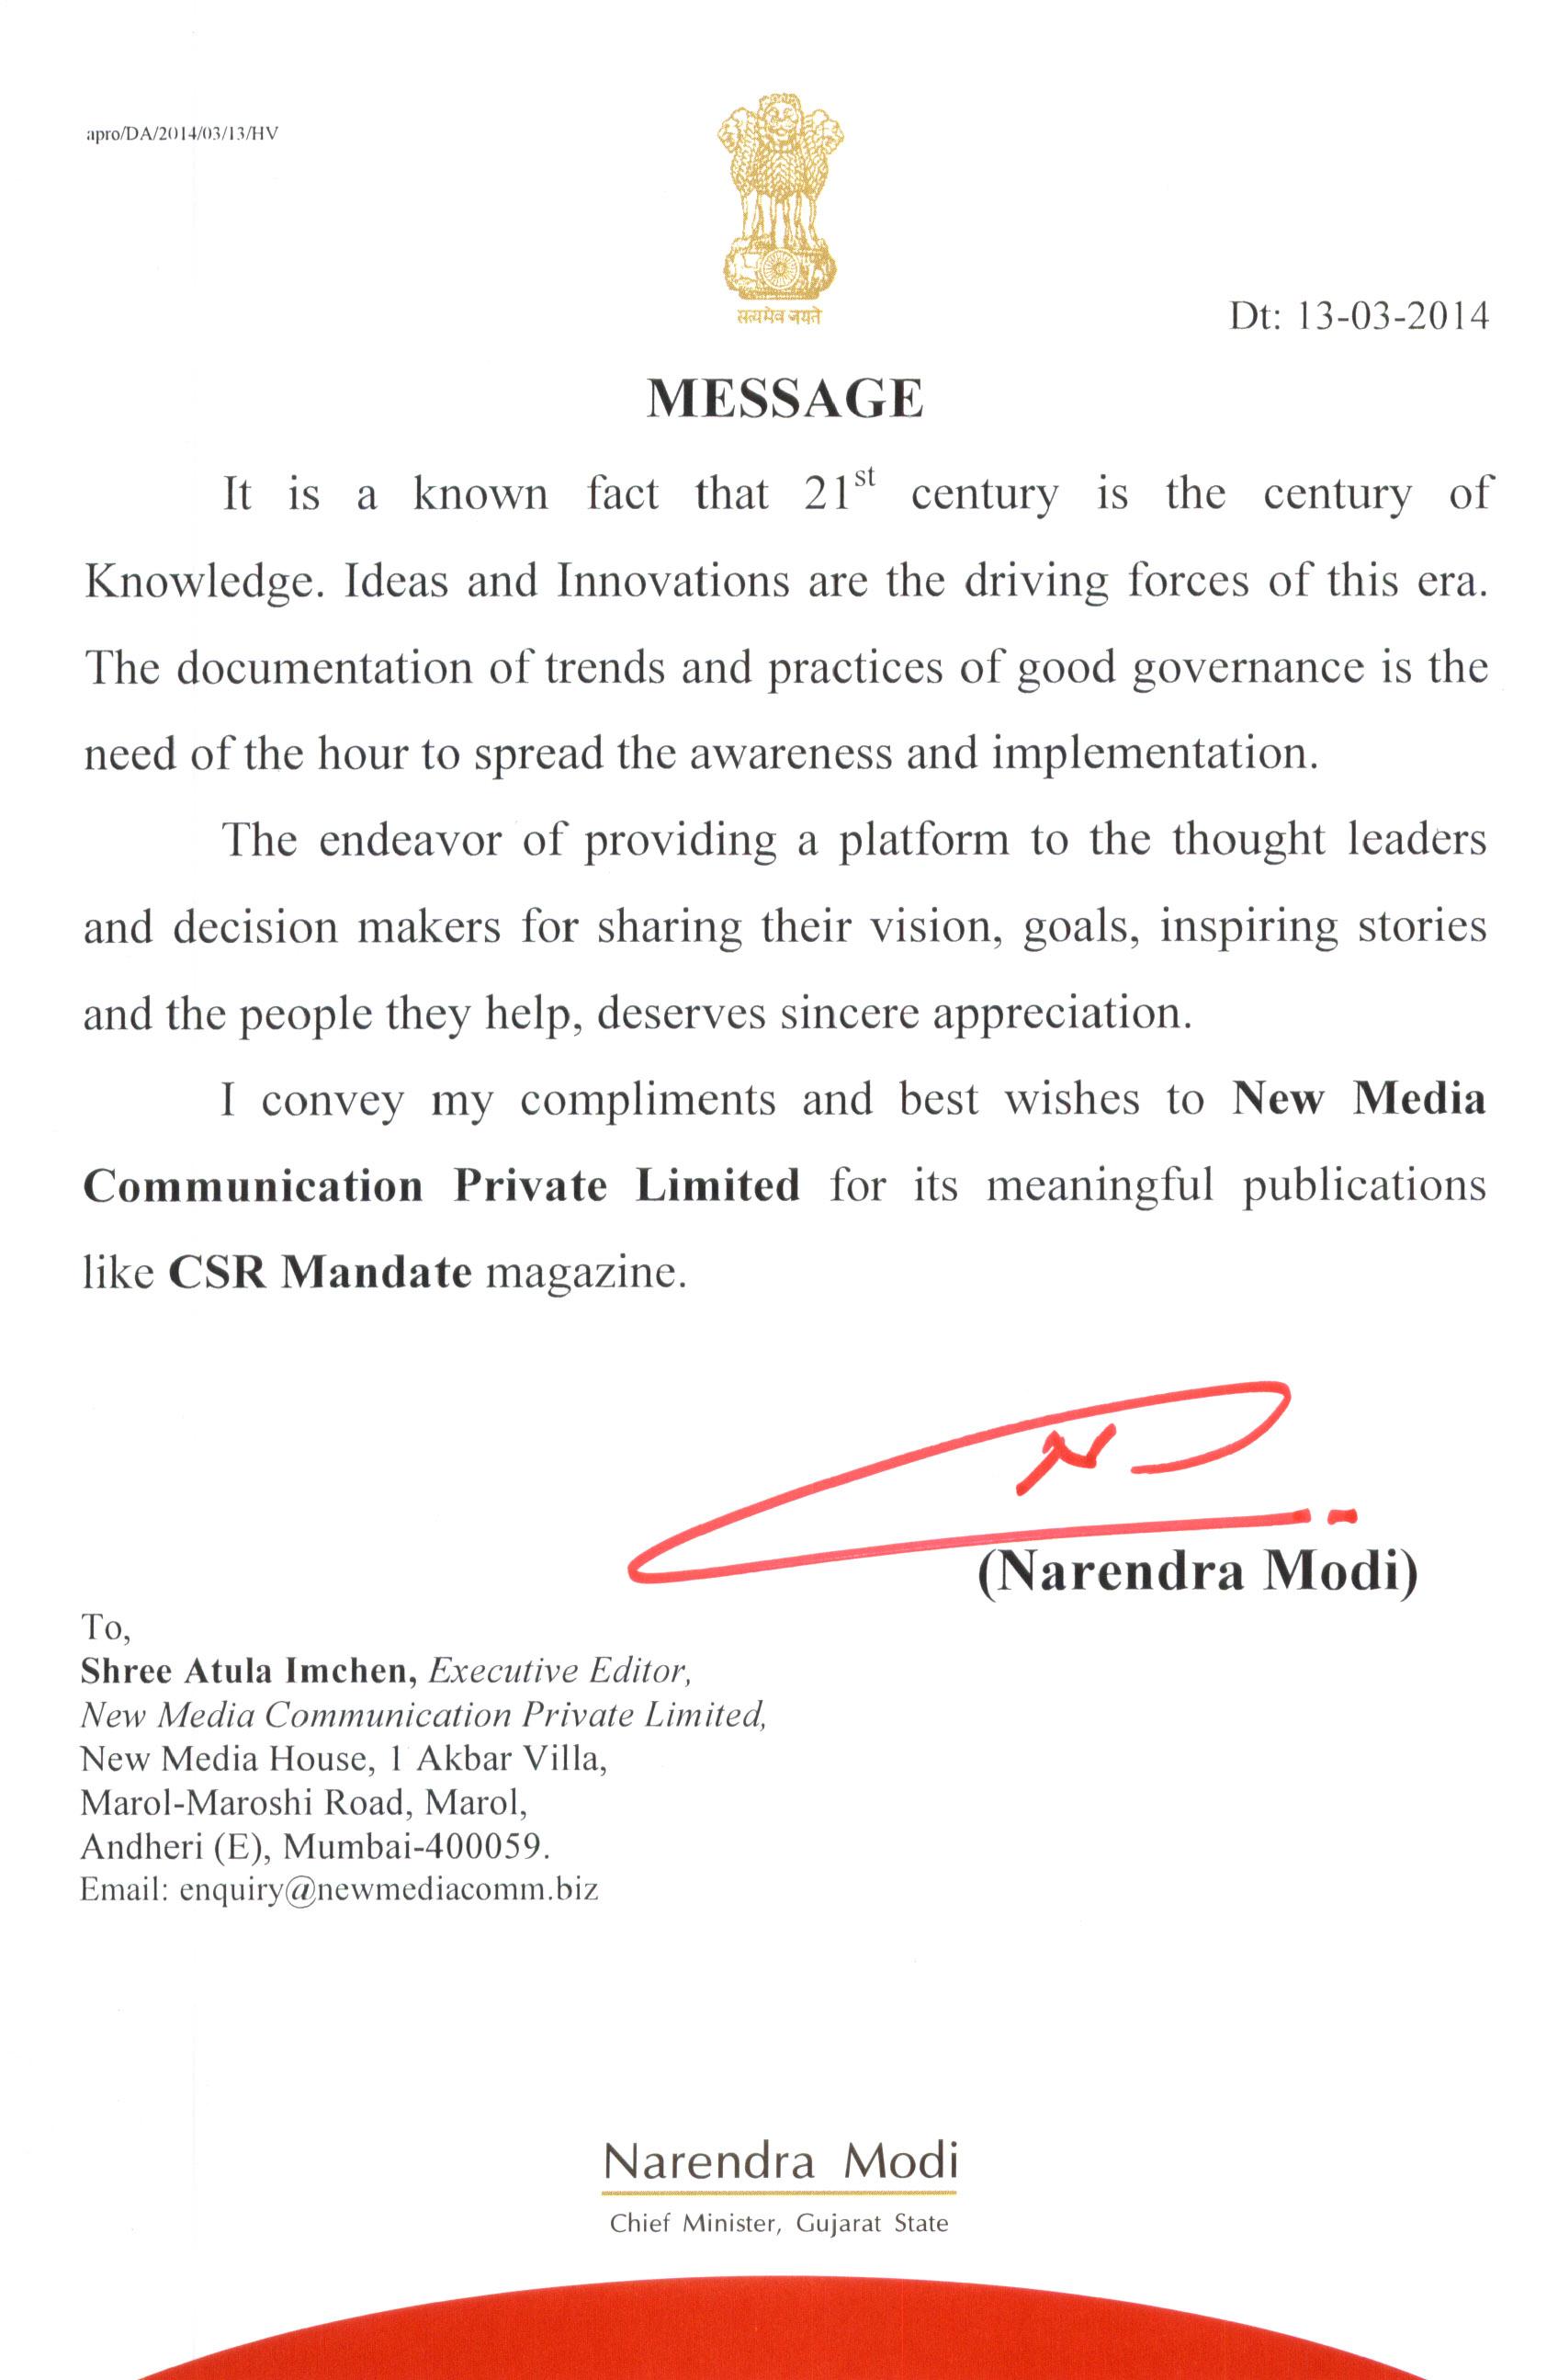 mr-narendra-modis-letter